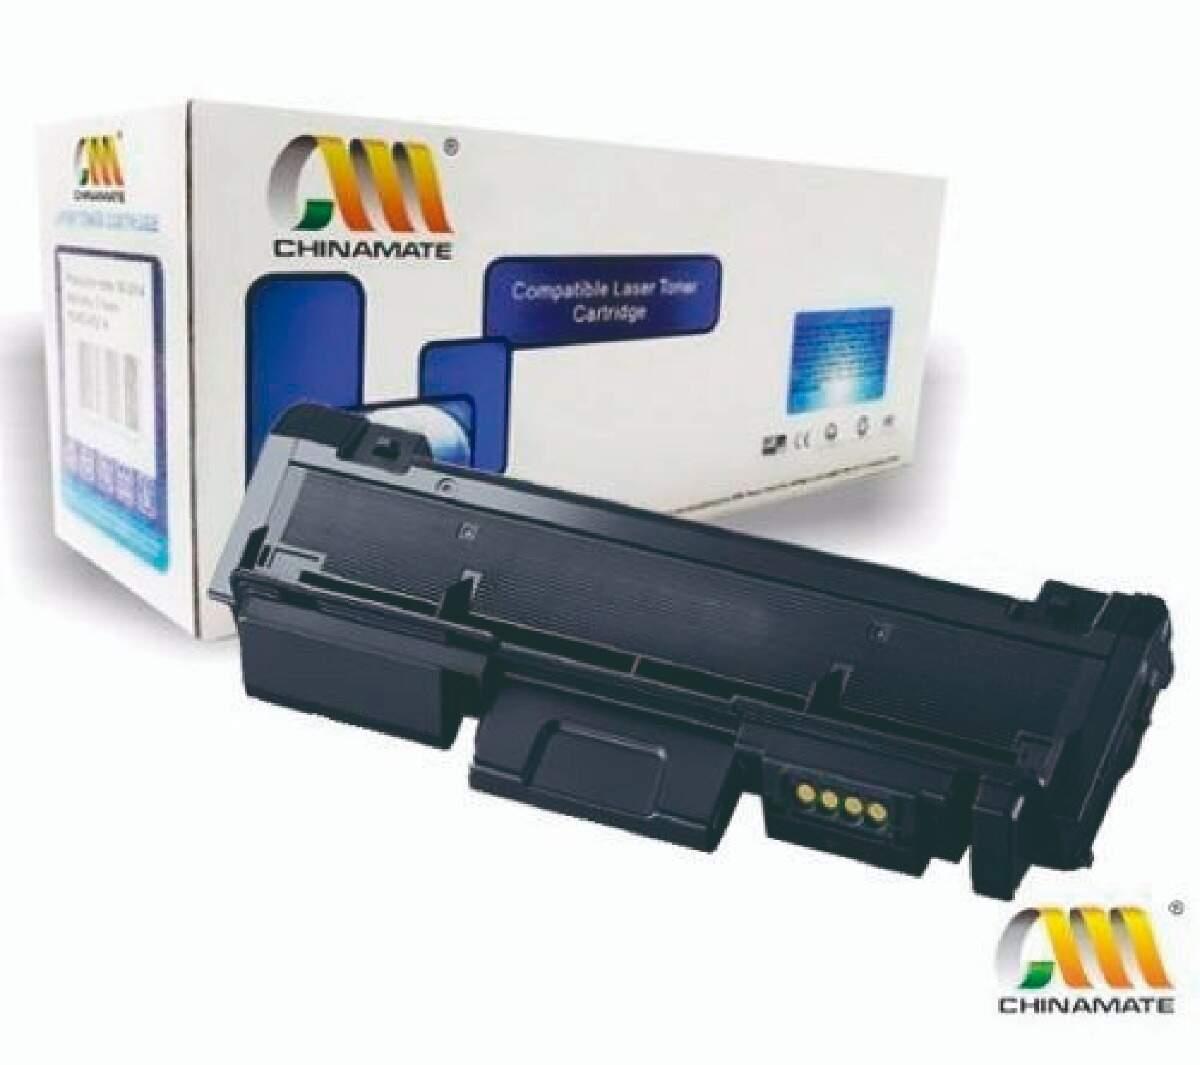 Toner MLT-D116L Chinamate Compatível com SL-M2625 SL-M2675F da Samsung